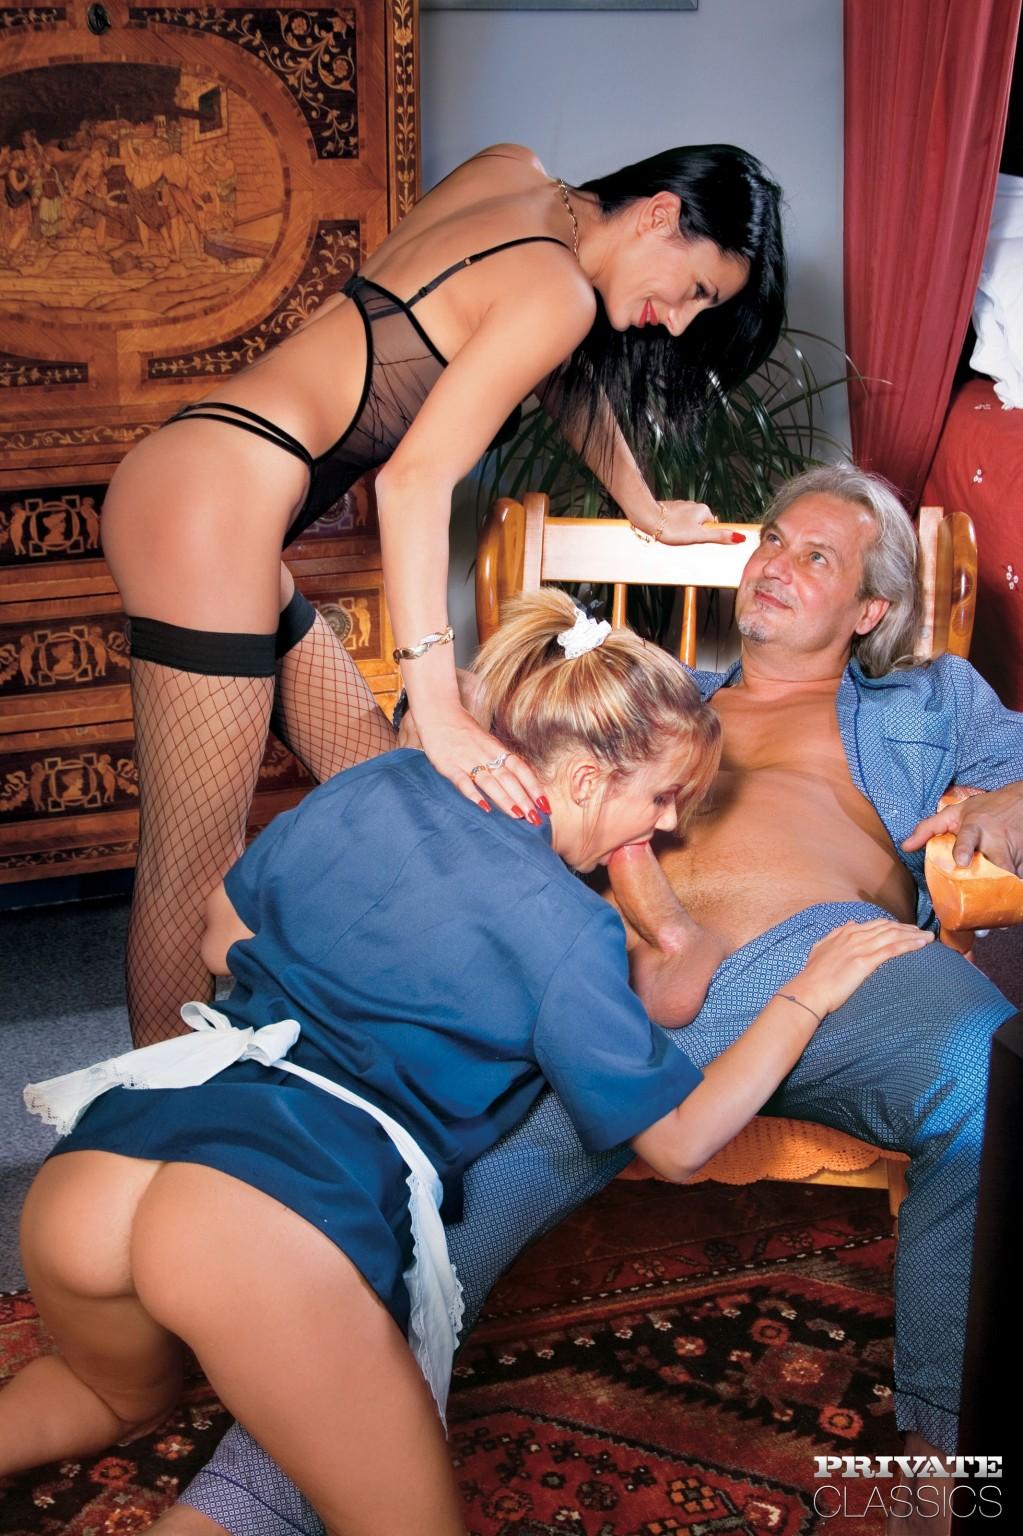 Mykiwis Porno Show deep stretching sofia rose - free porn photos, best xxx pics